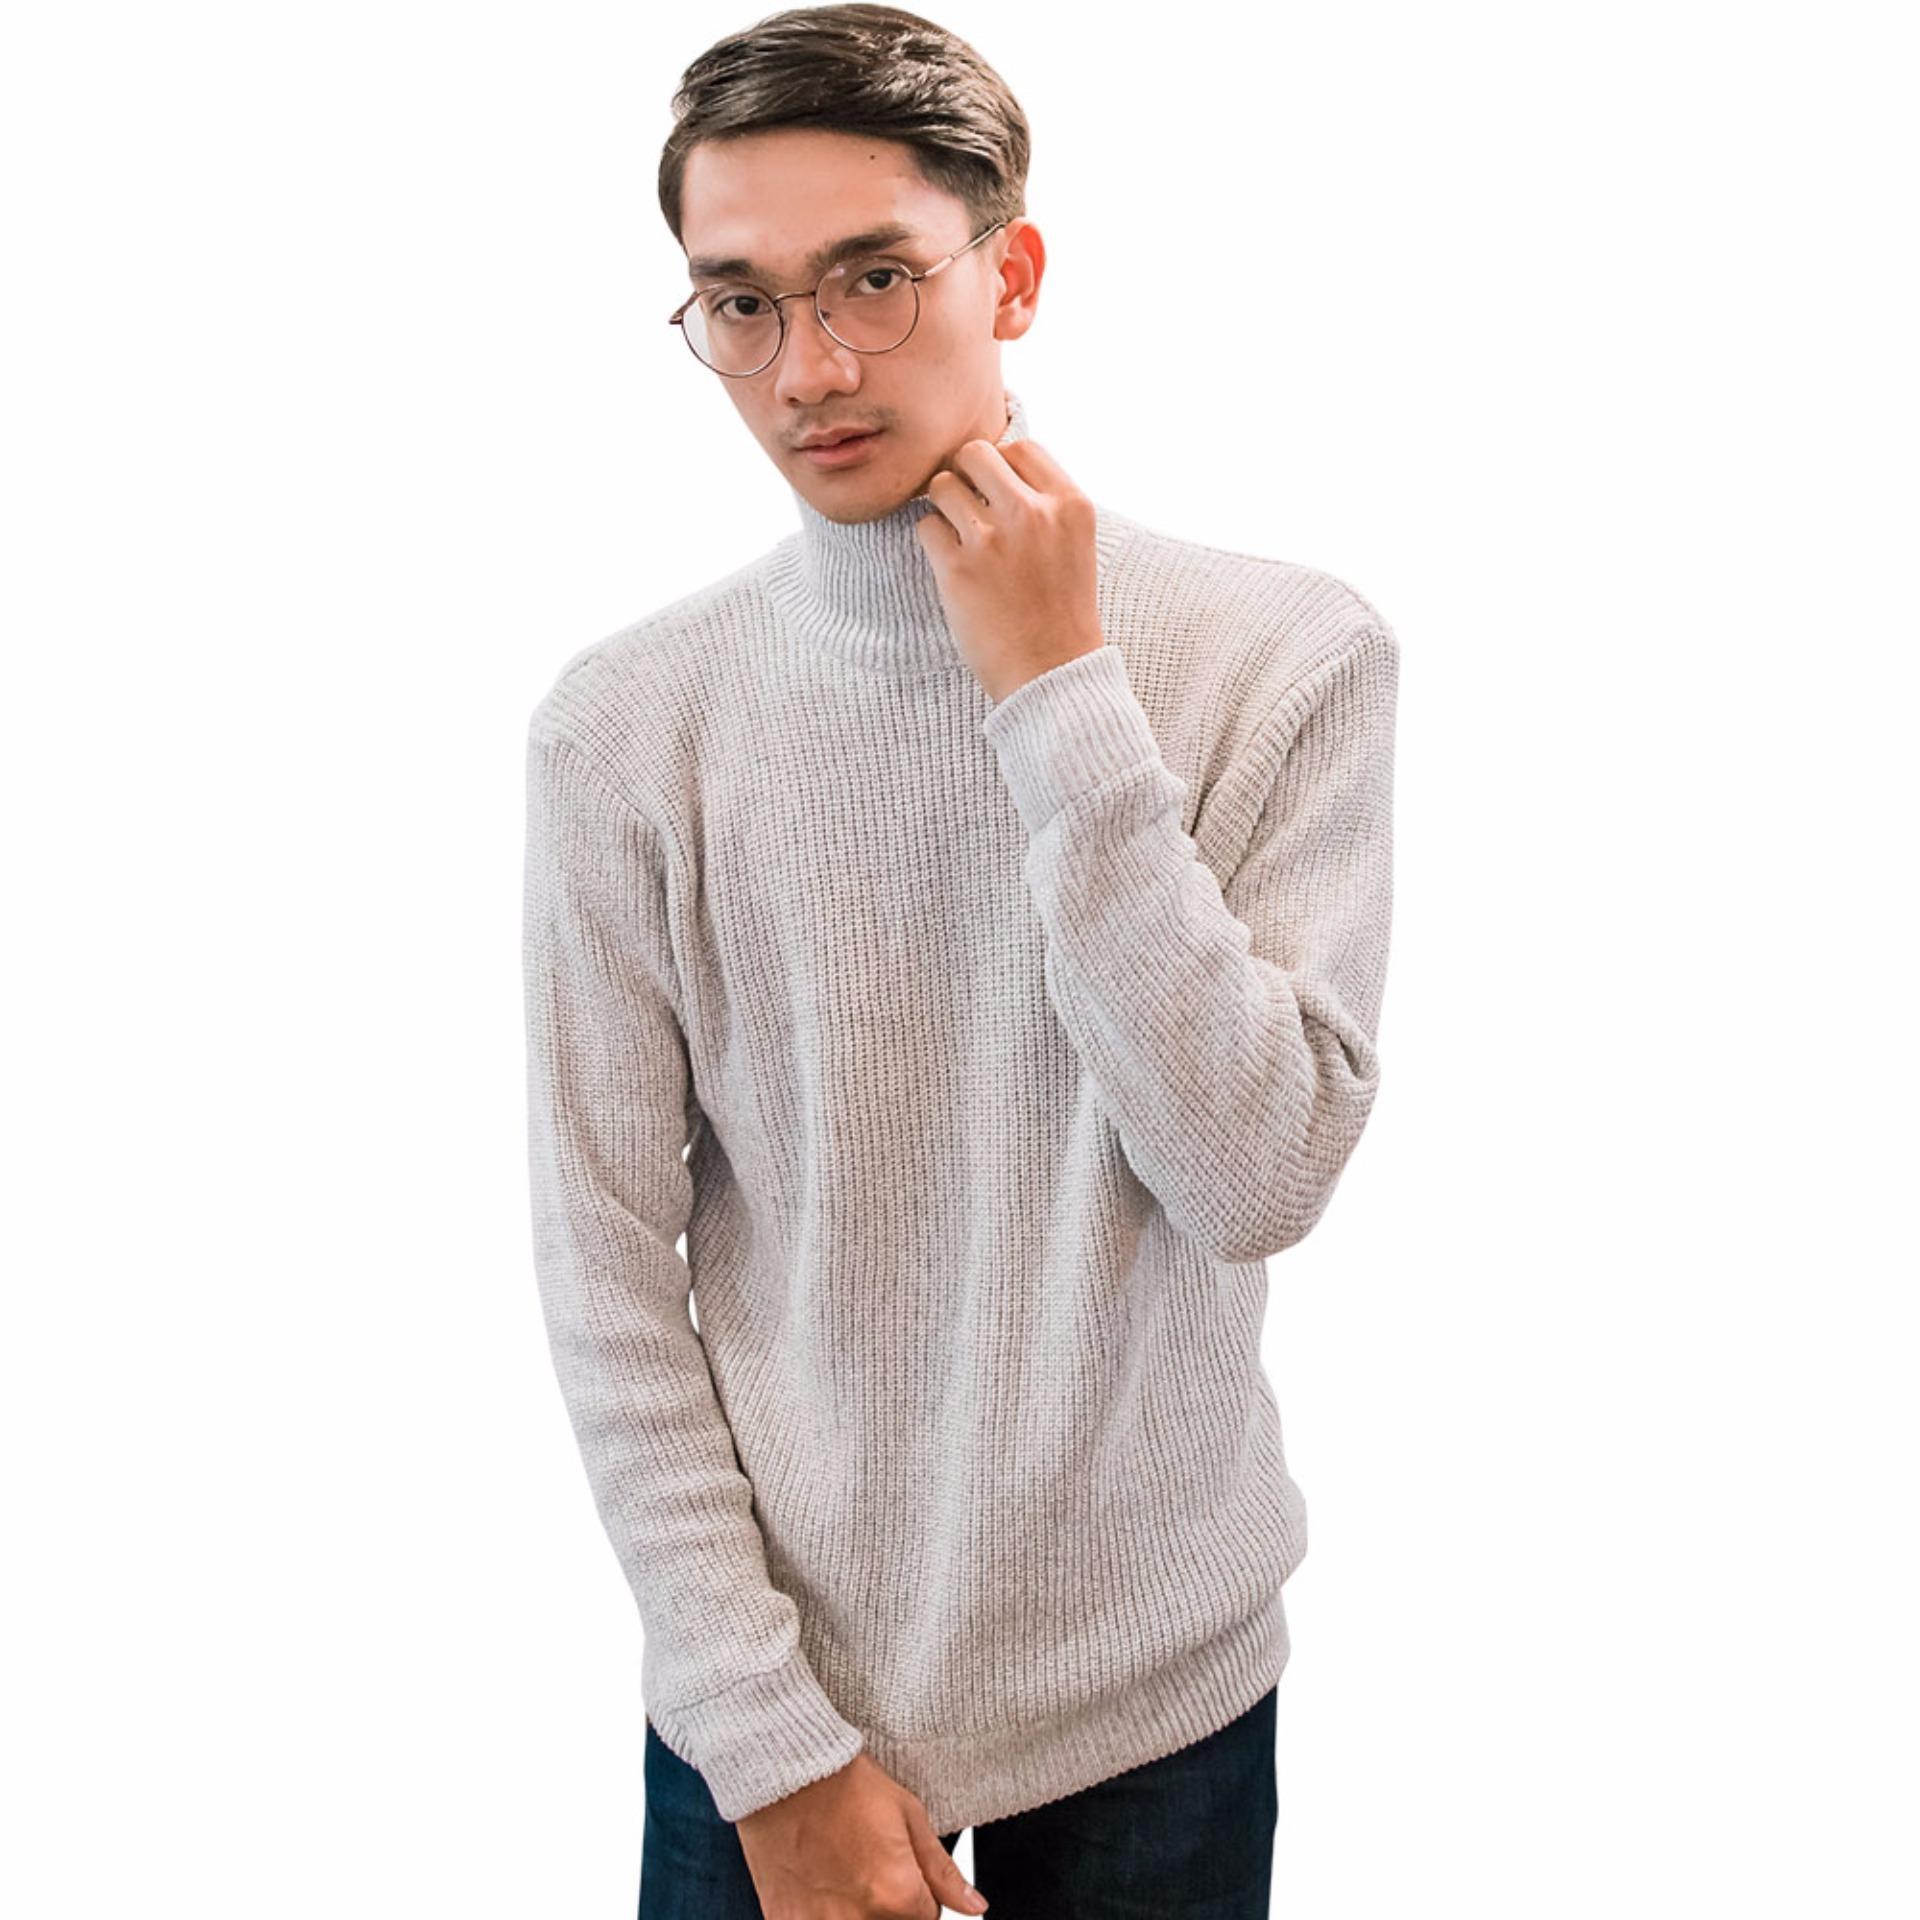 Gomuda Sweater Rajut Cord Turtleneck Putih Daftar Update Harga Pria O Neck Navor